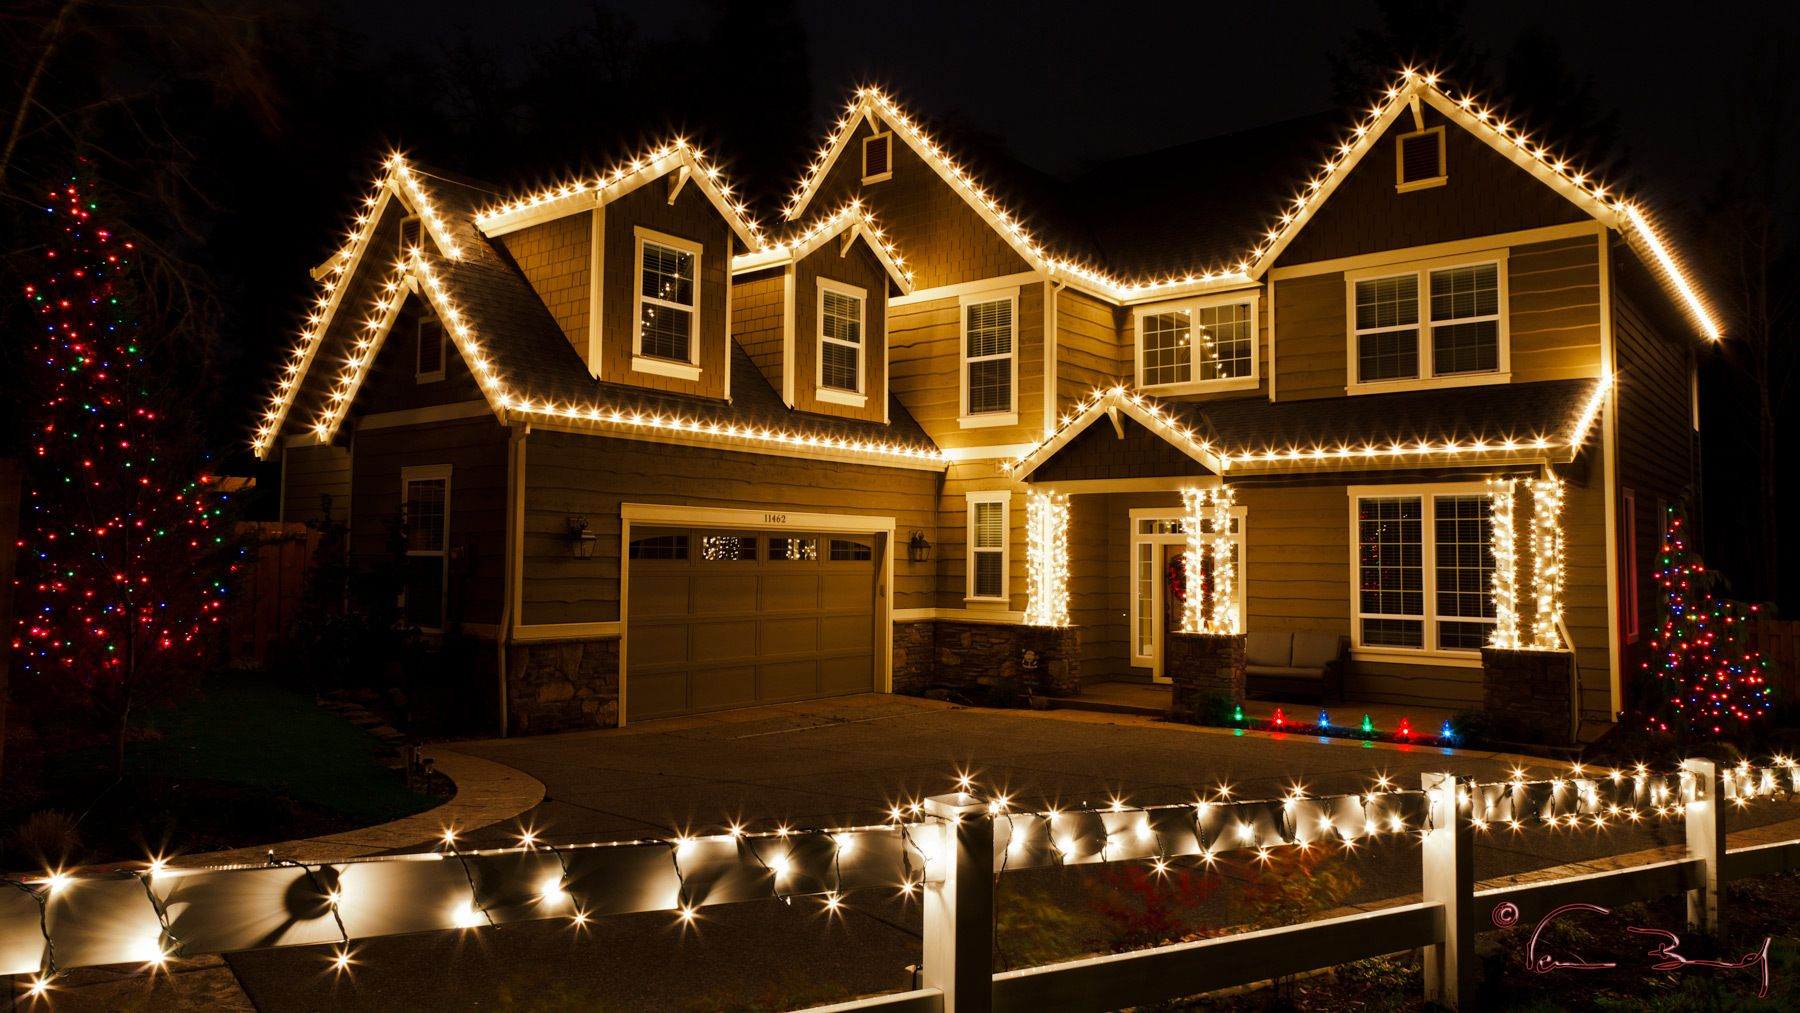 Christmas Decor Ideas Christmas House Lights Outdoor Christmas Lights Christmas Lights Outside